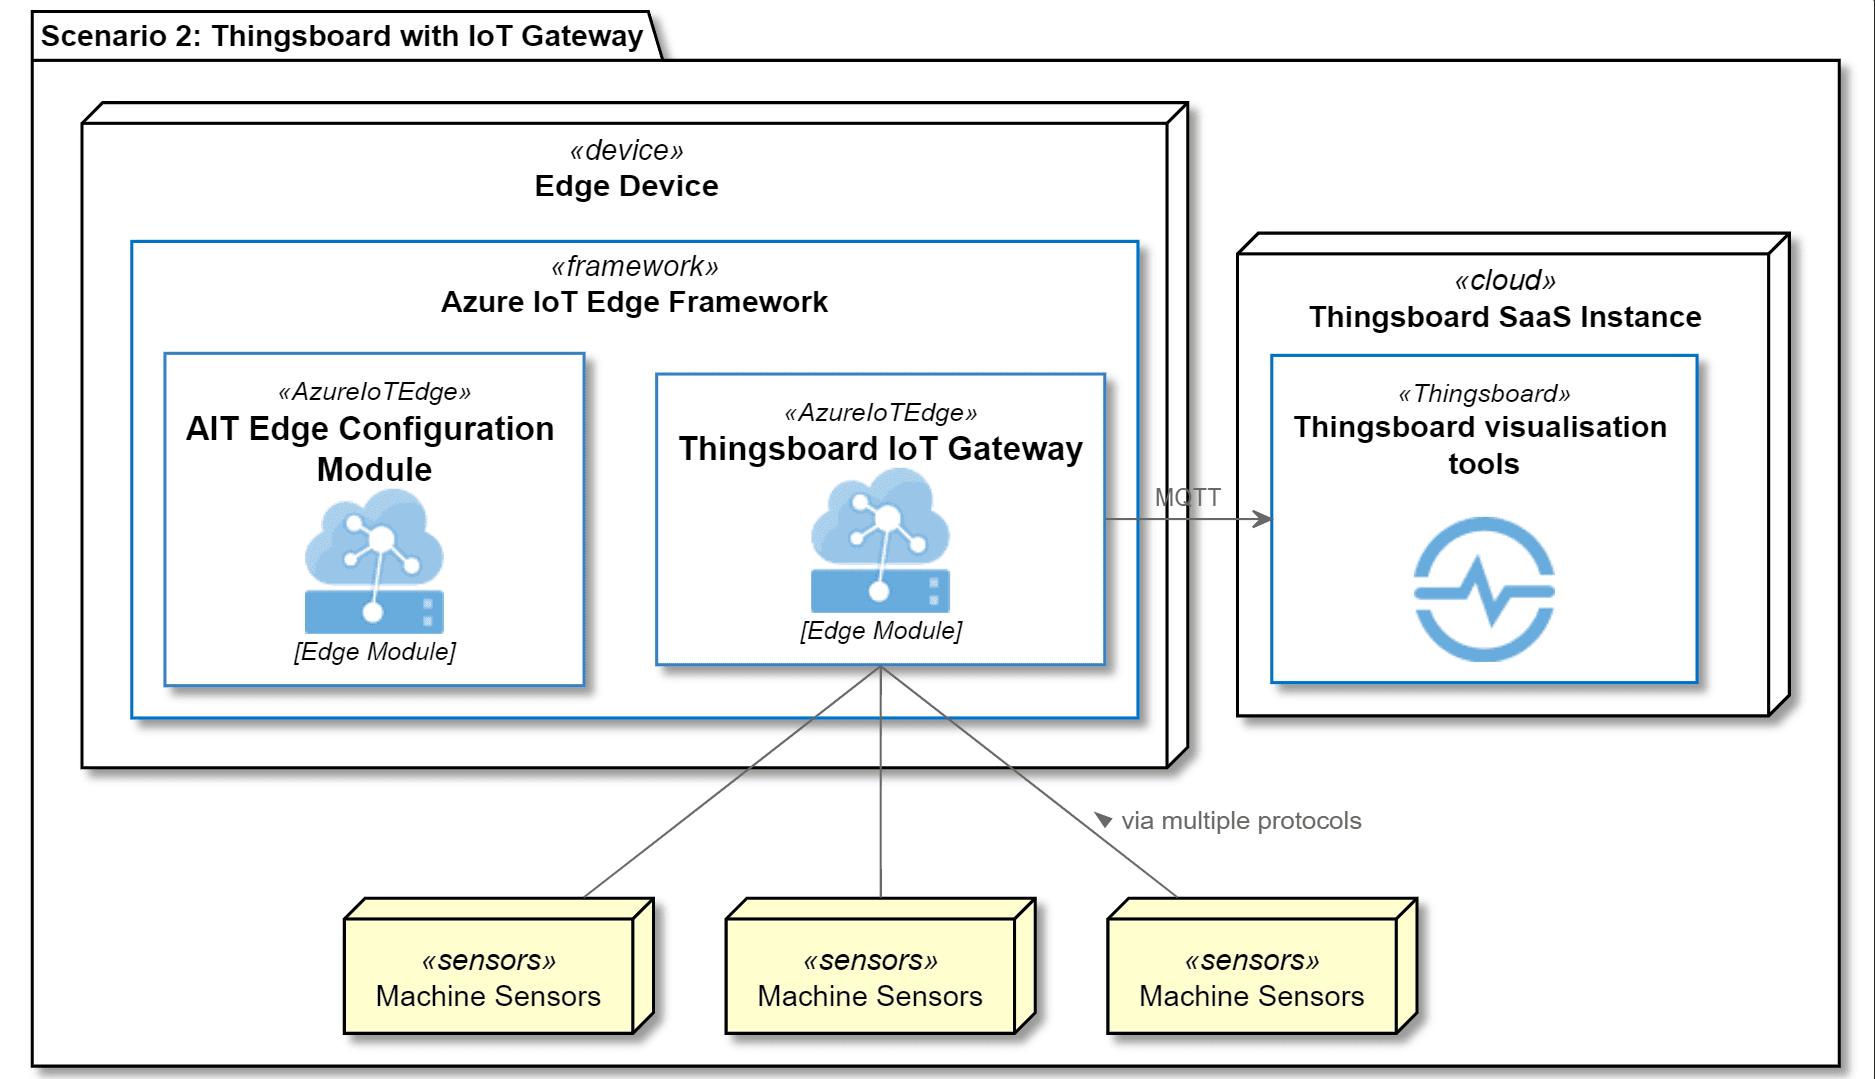 Szenario 2: Nutzung des Thingsboard IoT Gateways